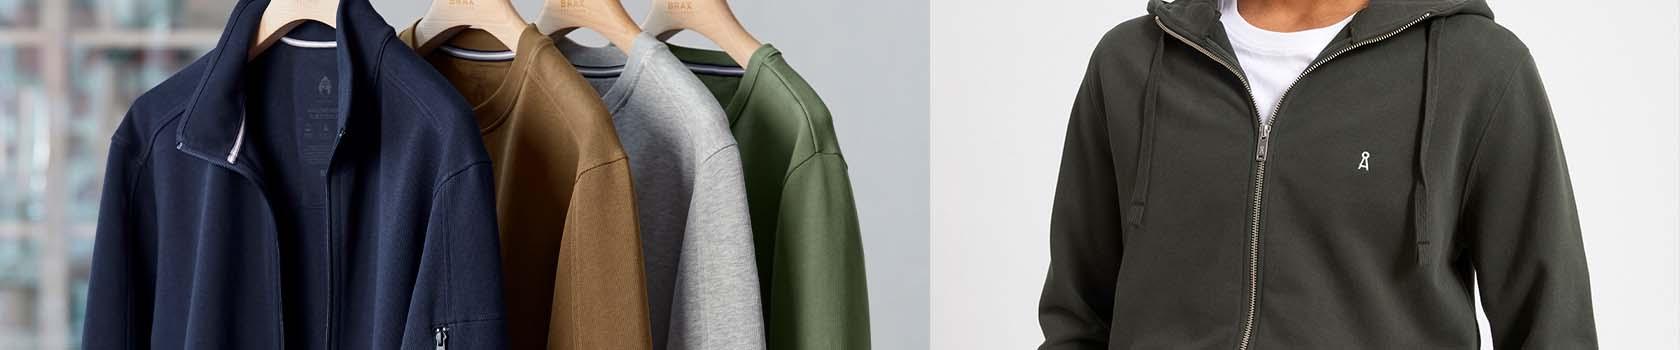 Sweatshirts & Sweat jackets